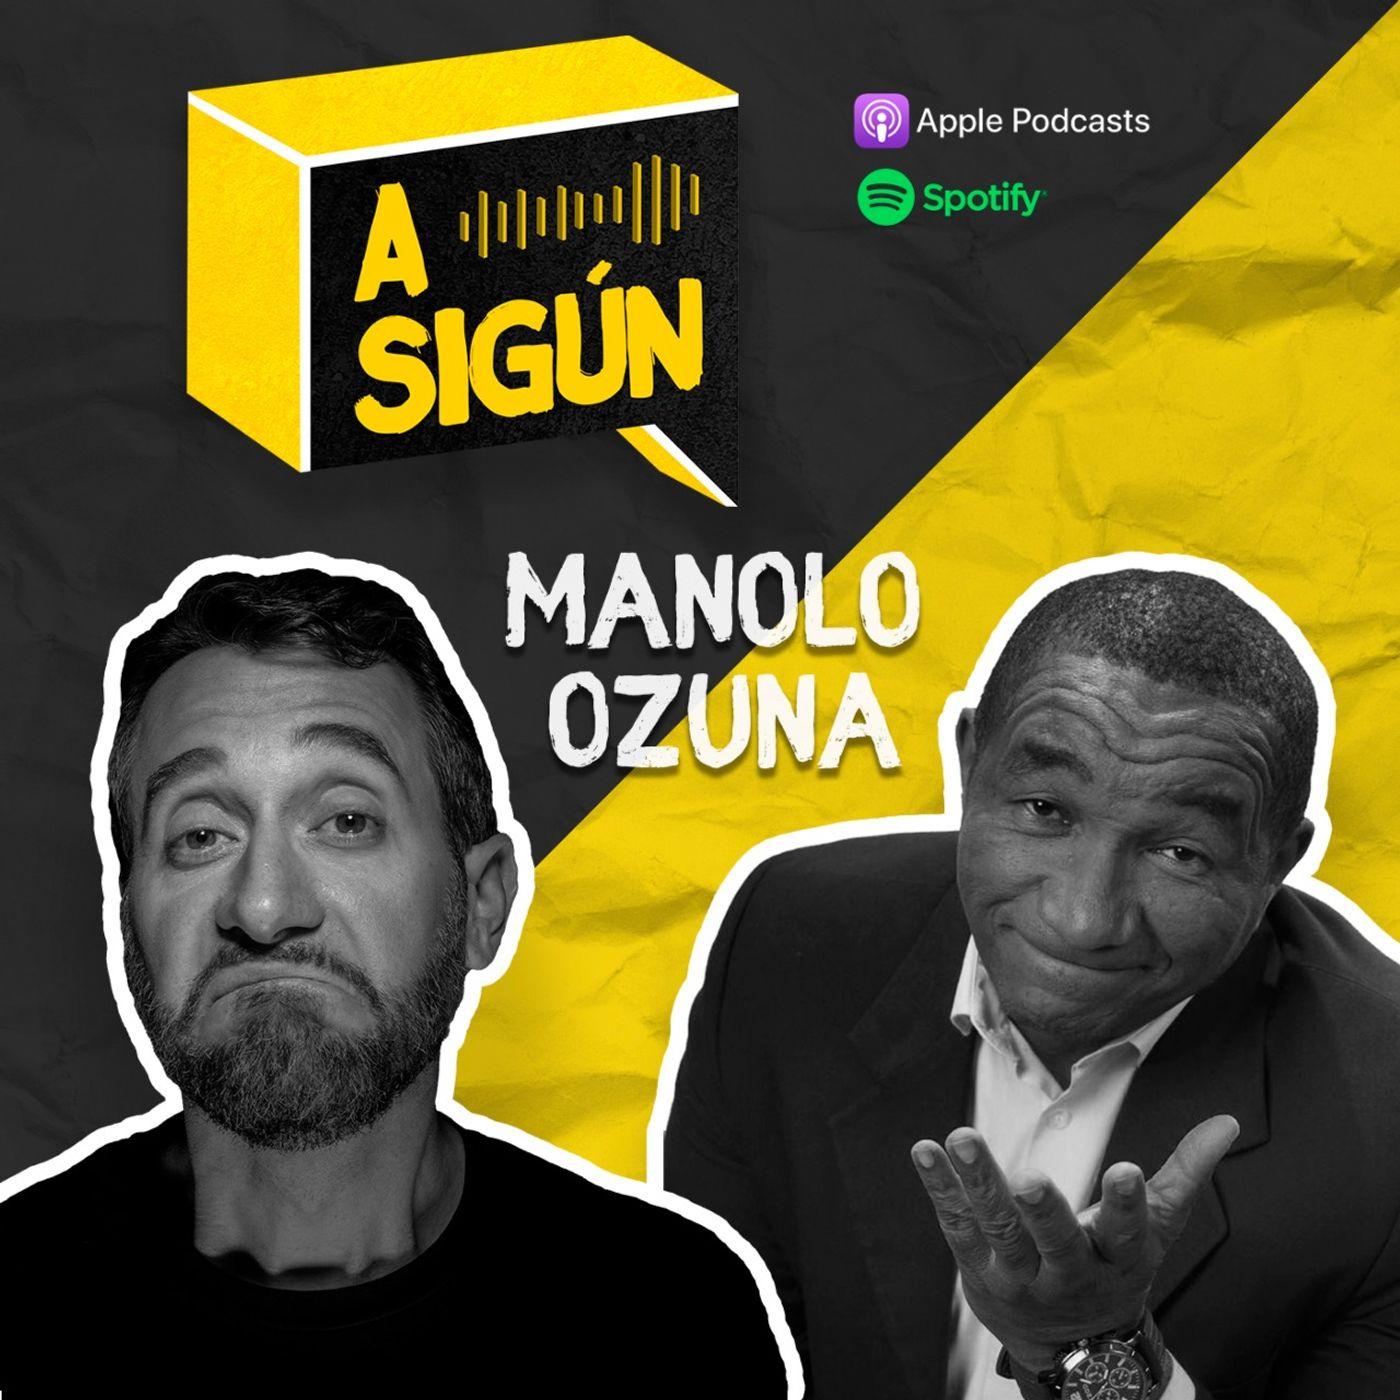 009. A SIGÚN: Manolo Ozuna